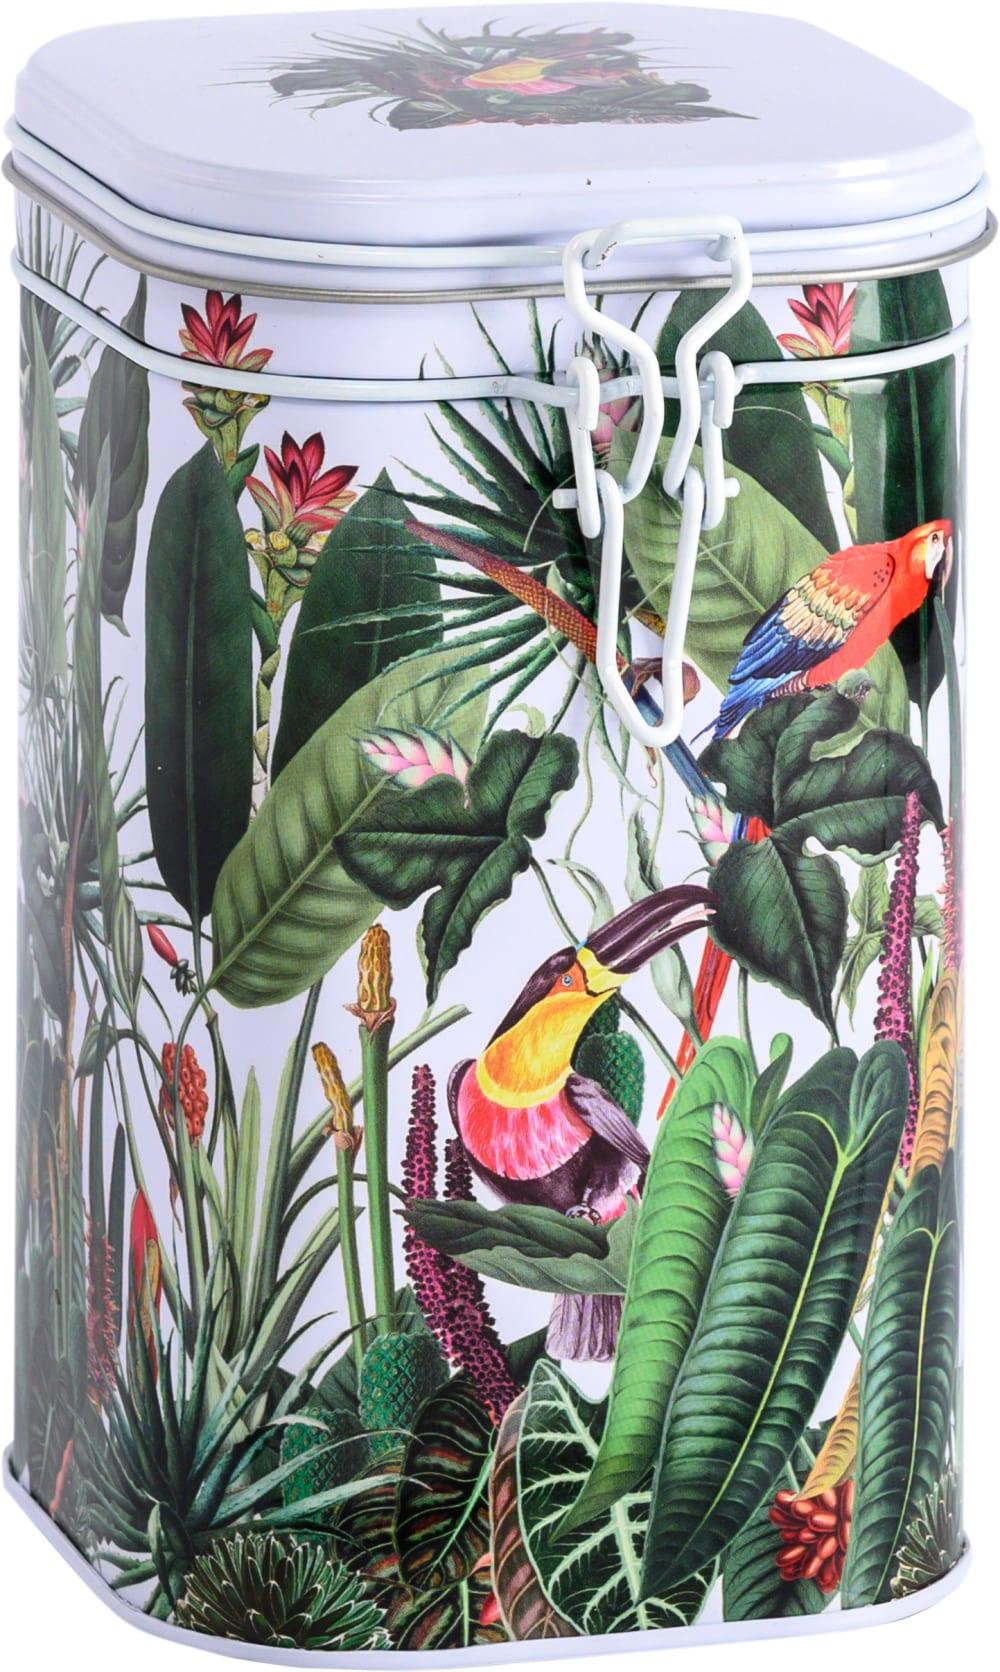 Puszka na herbatę Rainforest light 250 g